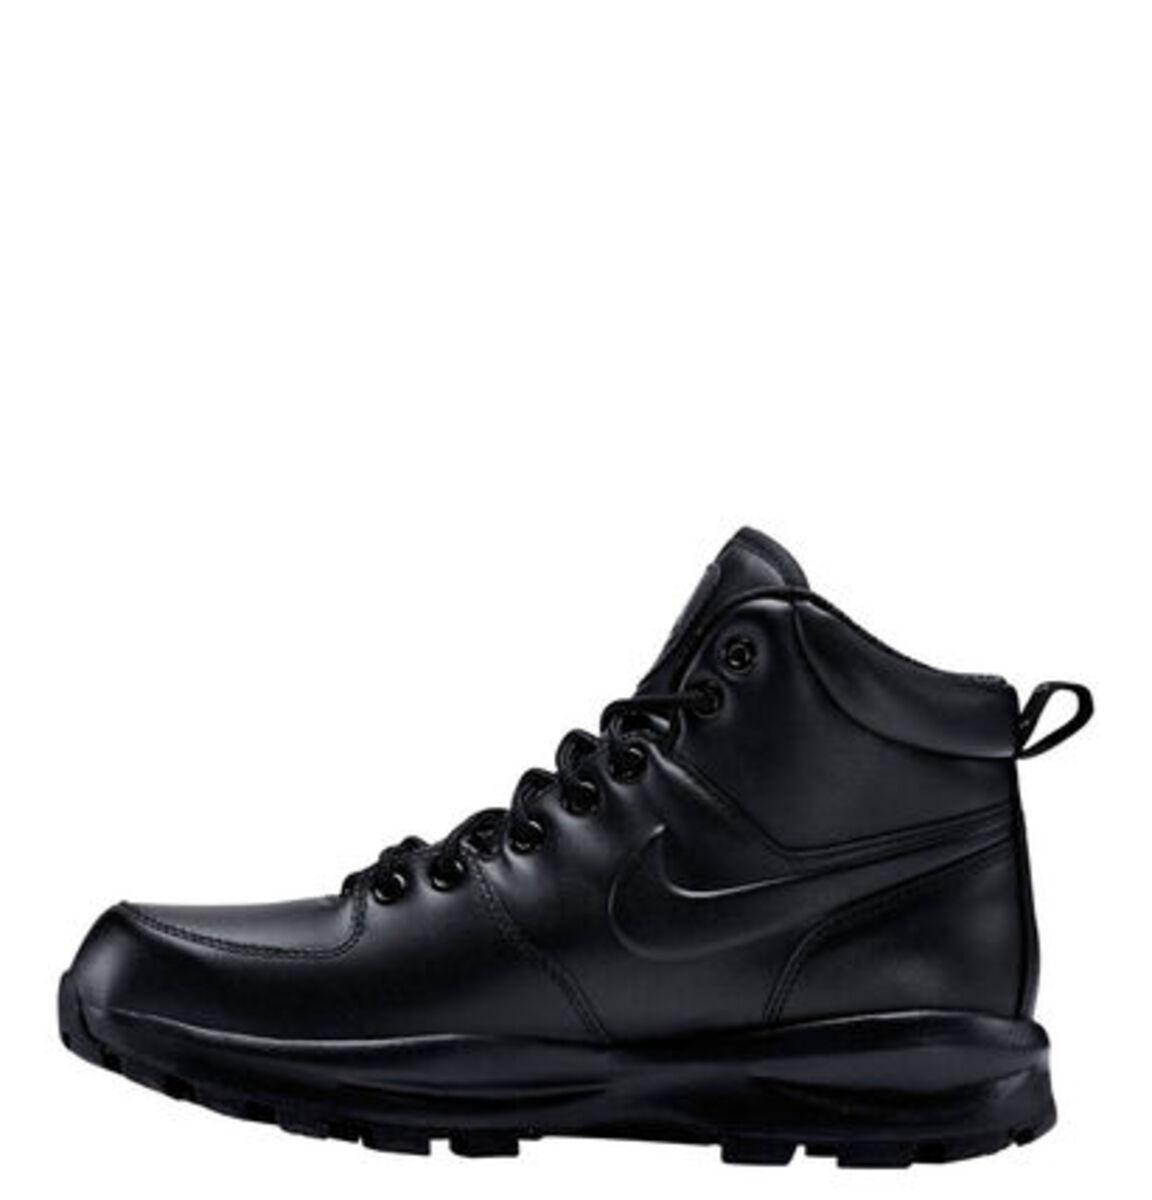 Bild 3 von Nike Herren Boots Manoa, schwarz, 41, 41